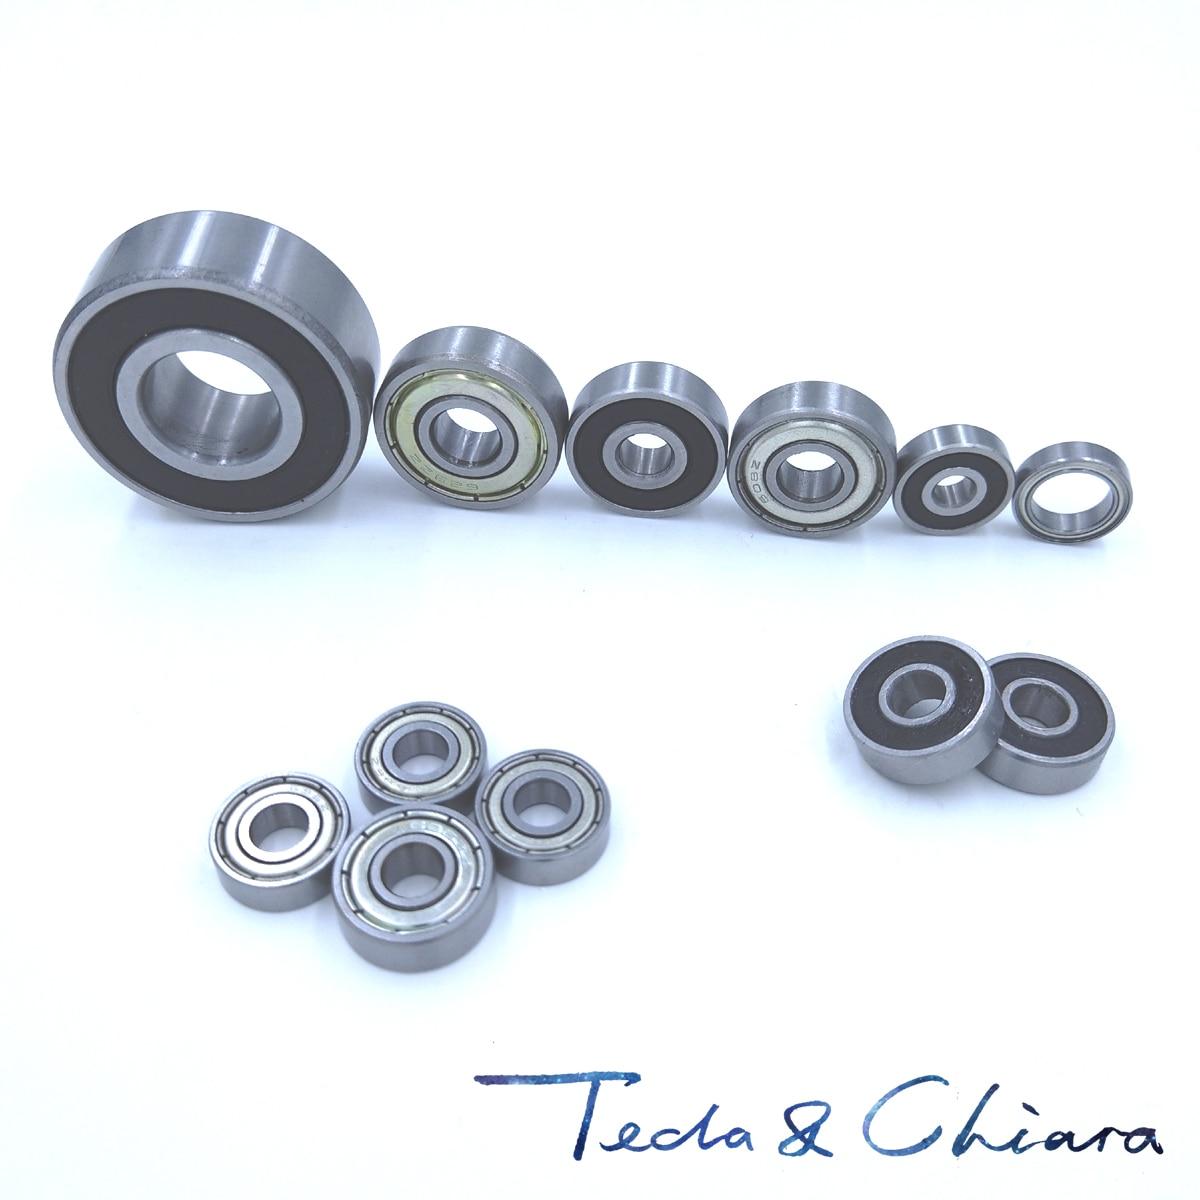 5pcs S6201zz 12x32x10 mm S6201 Stainless Steel 440c Ball Bearing Bearings